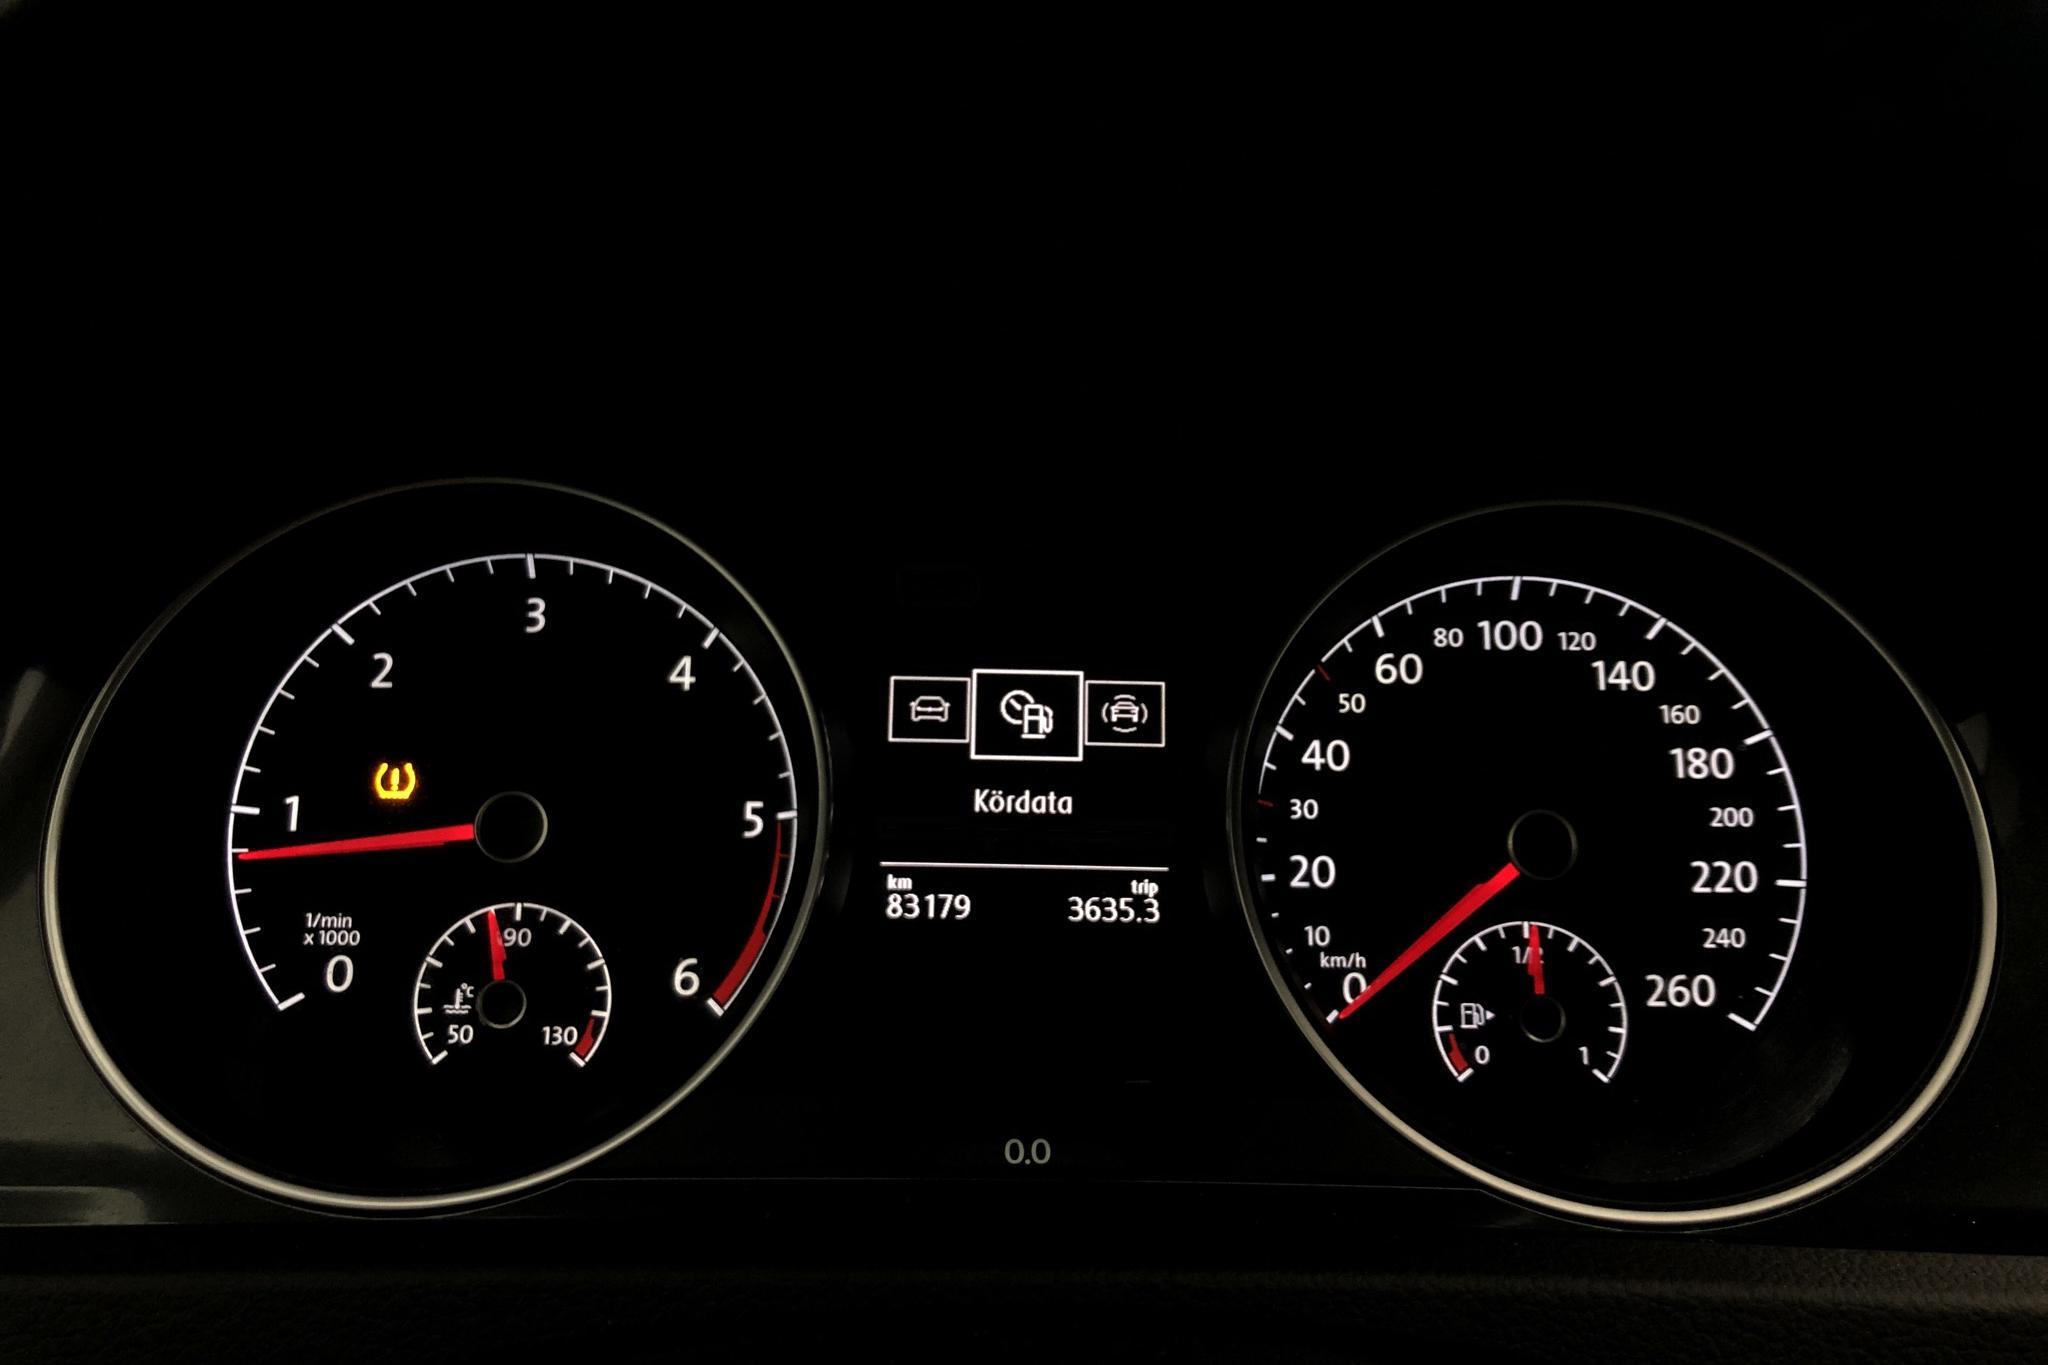 VW Golf VII 1.6 TDI 5dr (115hk) - 8 317 mil - Manuell - vit - 2018